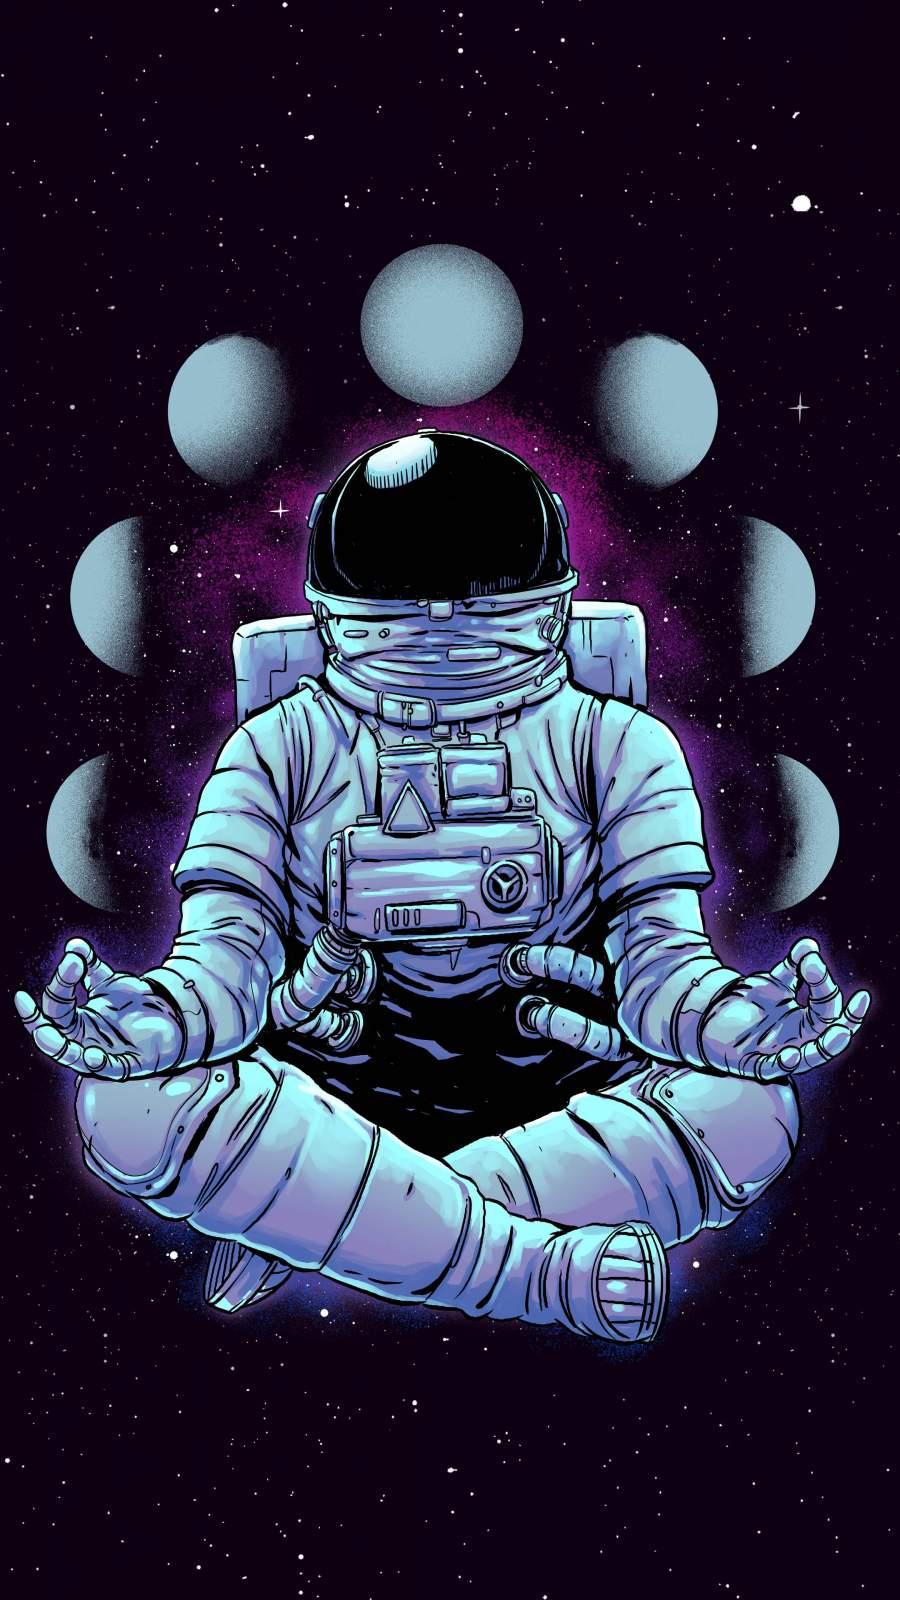 Meditation Astronaut iPhone Wallpaper